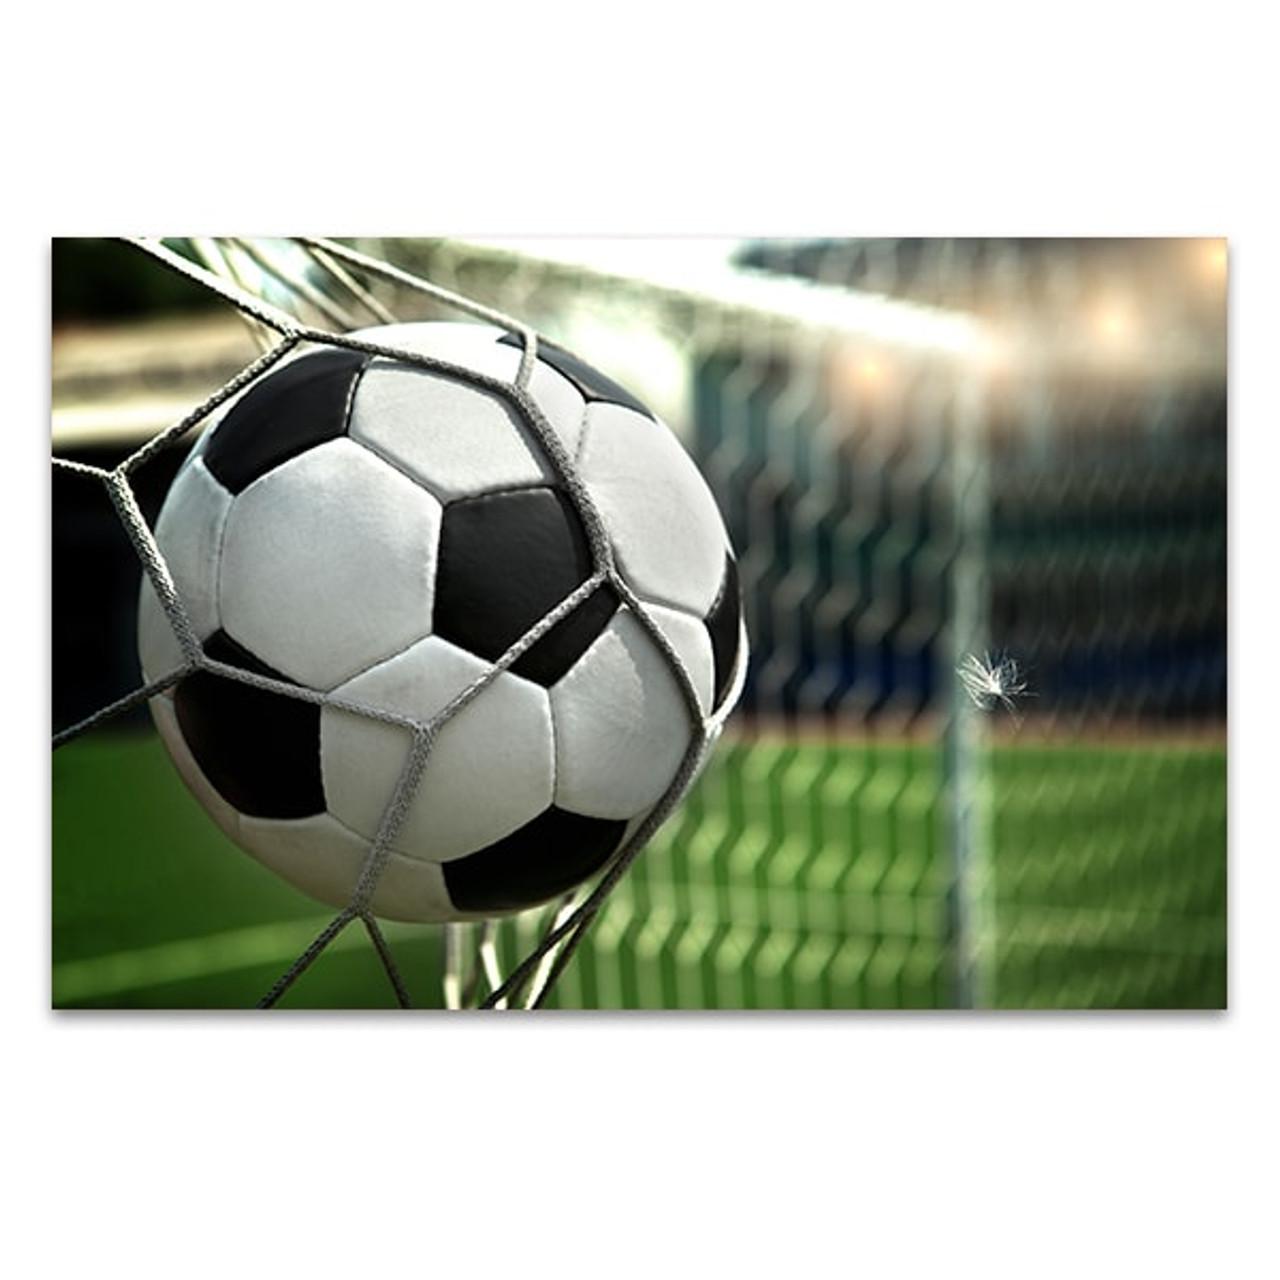 Football on Net Sports Wall Art Print For Sale Online